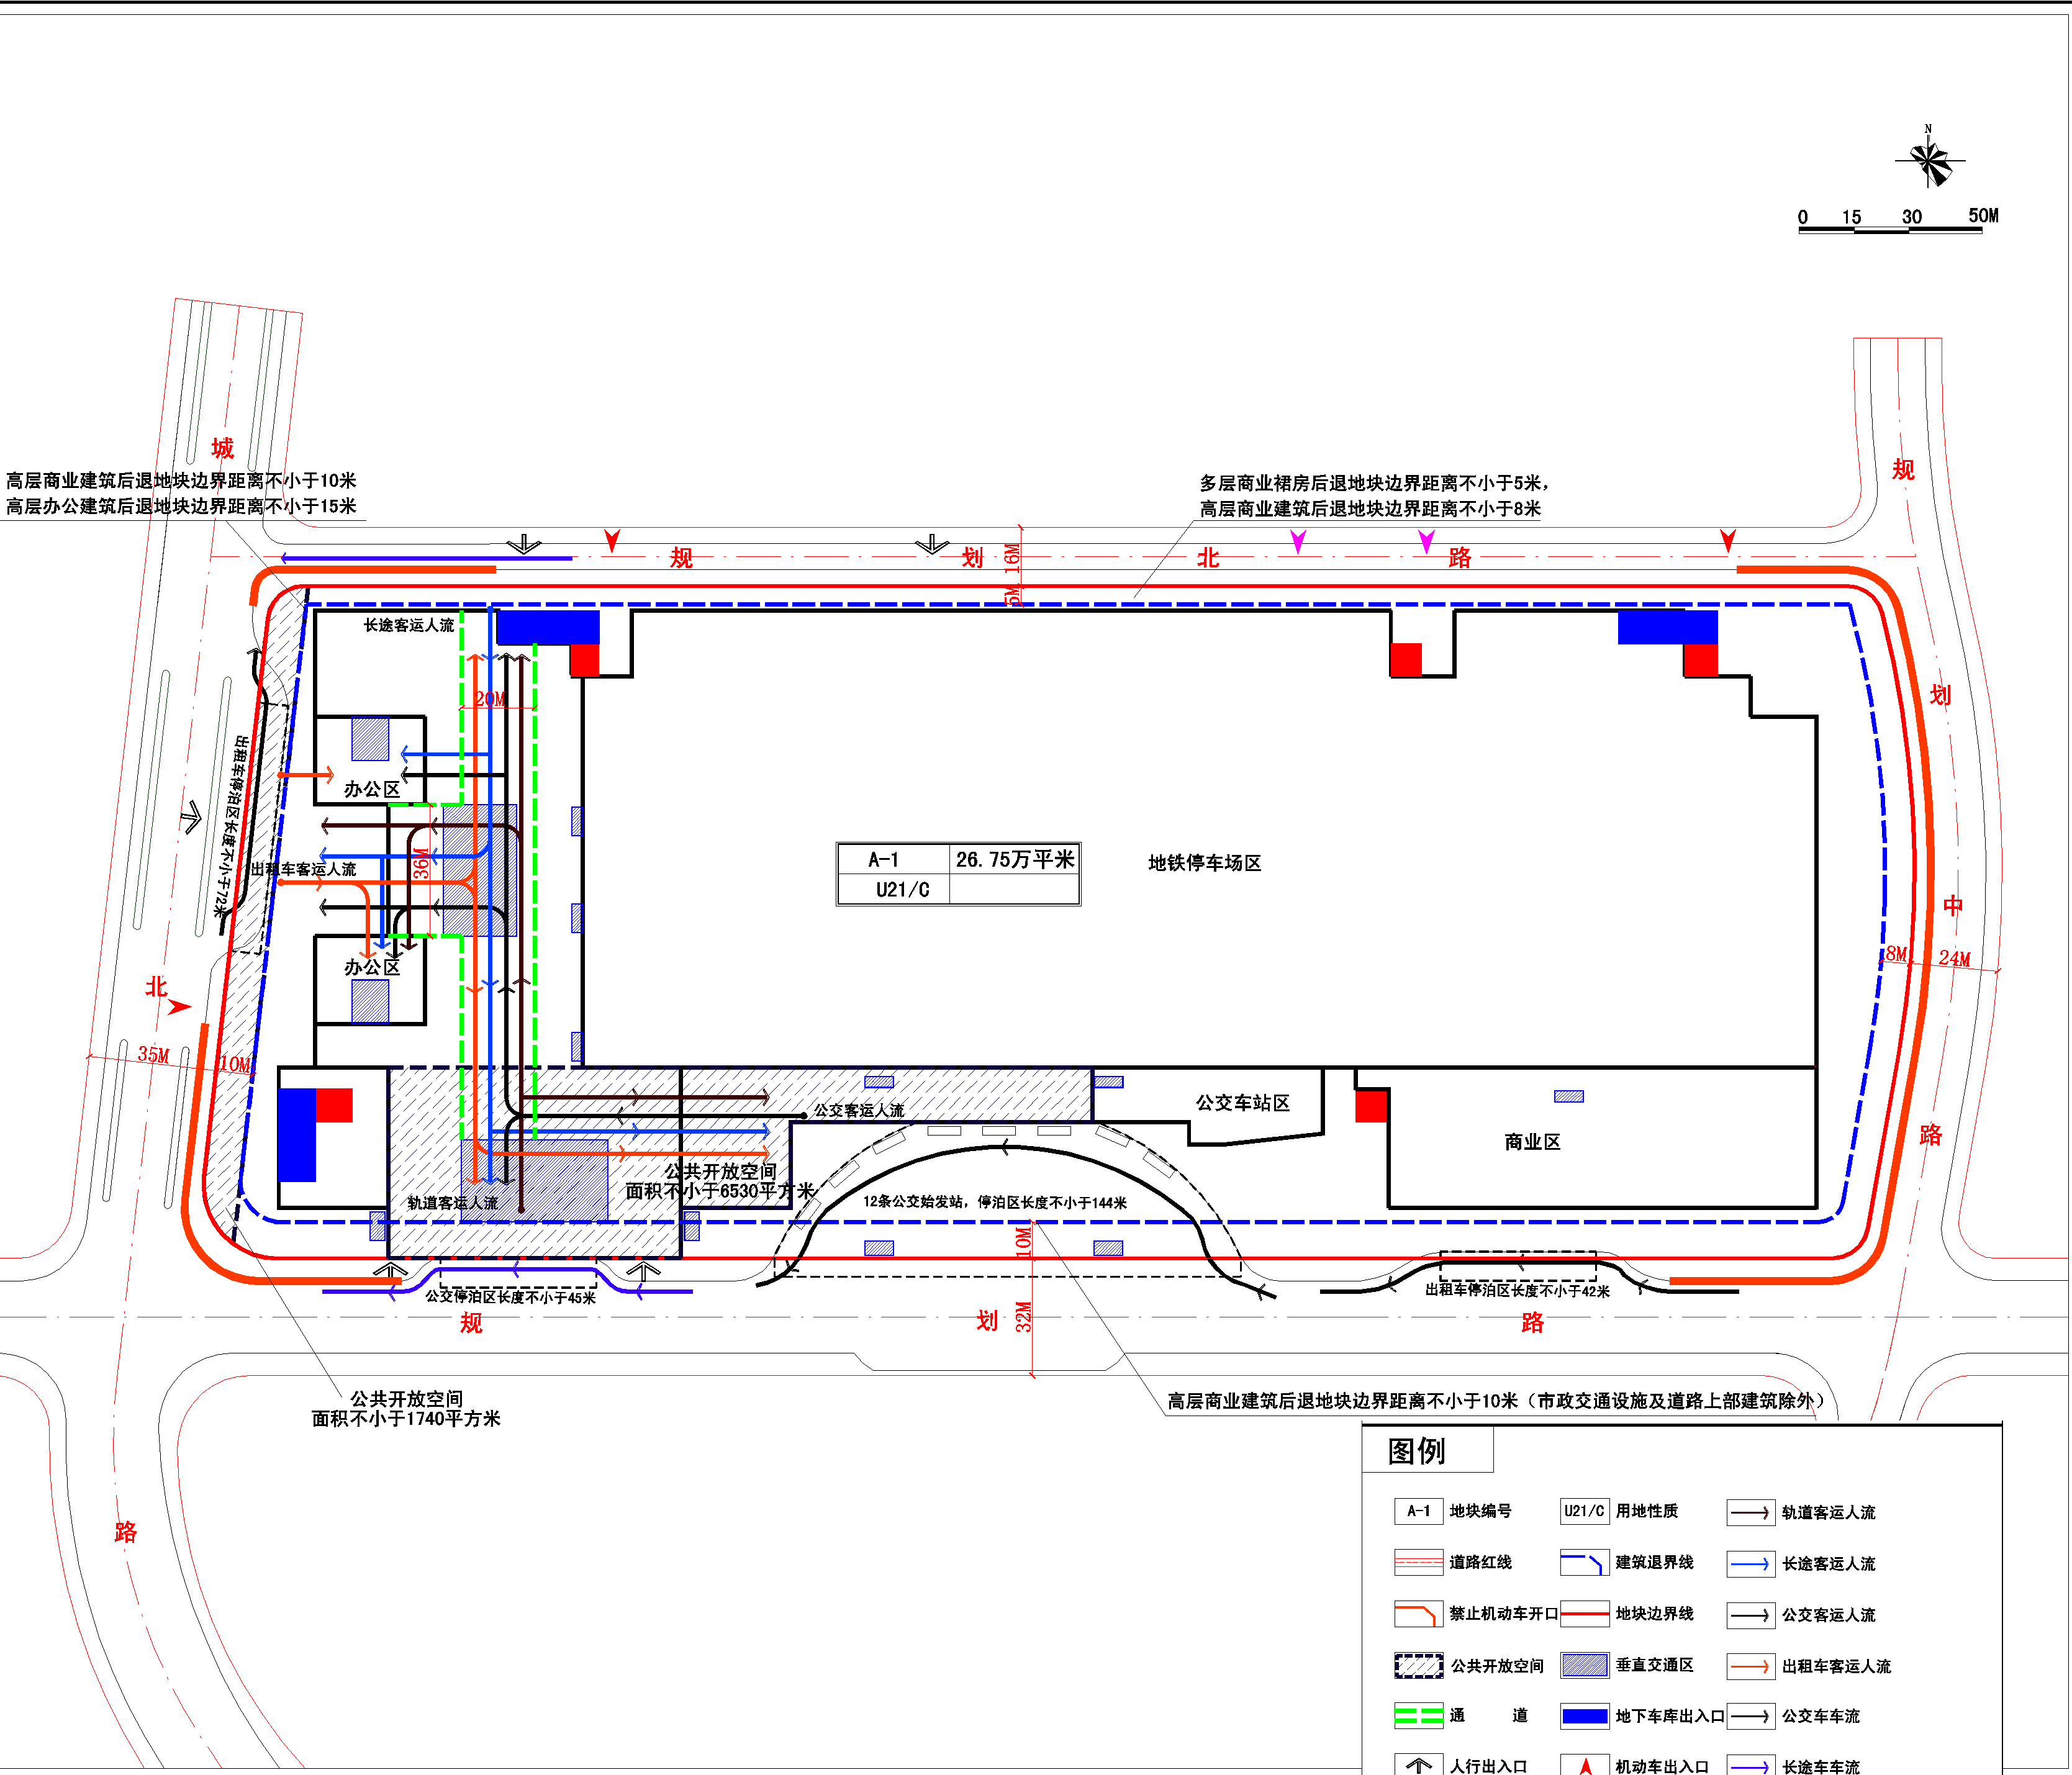 A地块地上一层开发控制图则副本